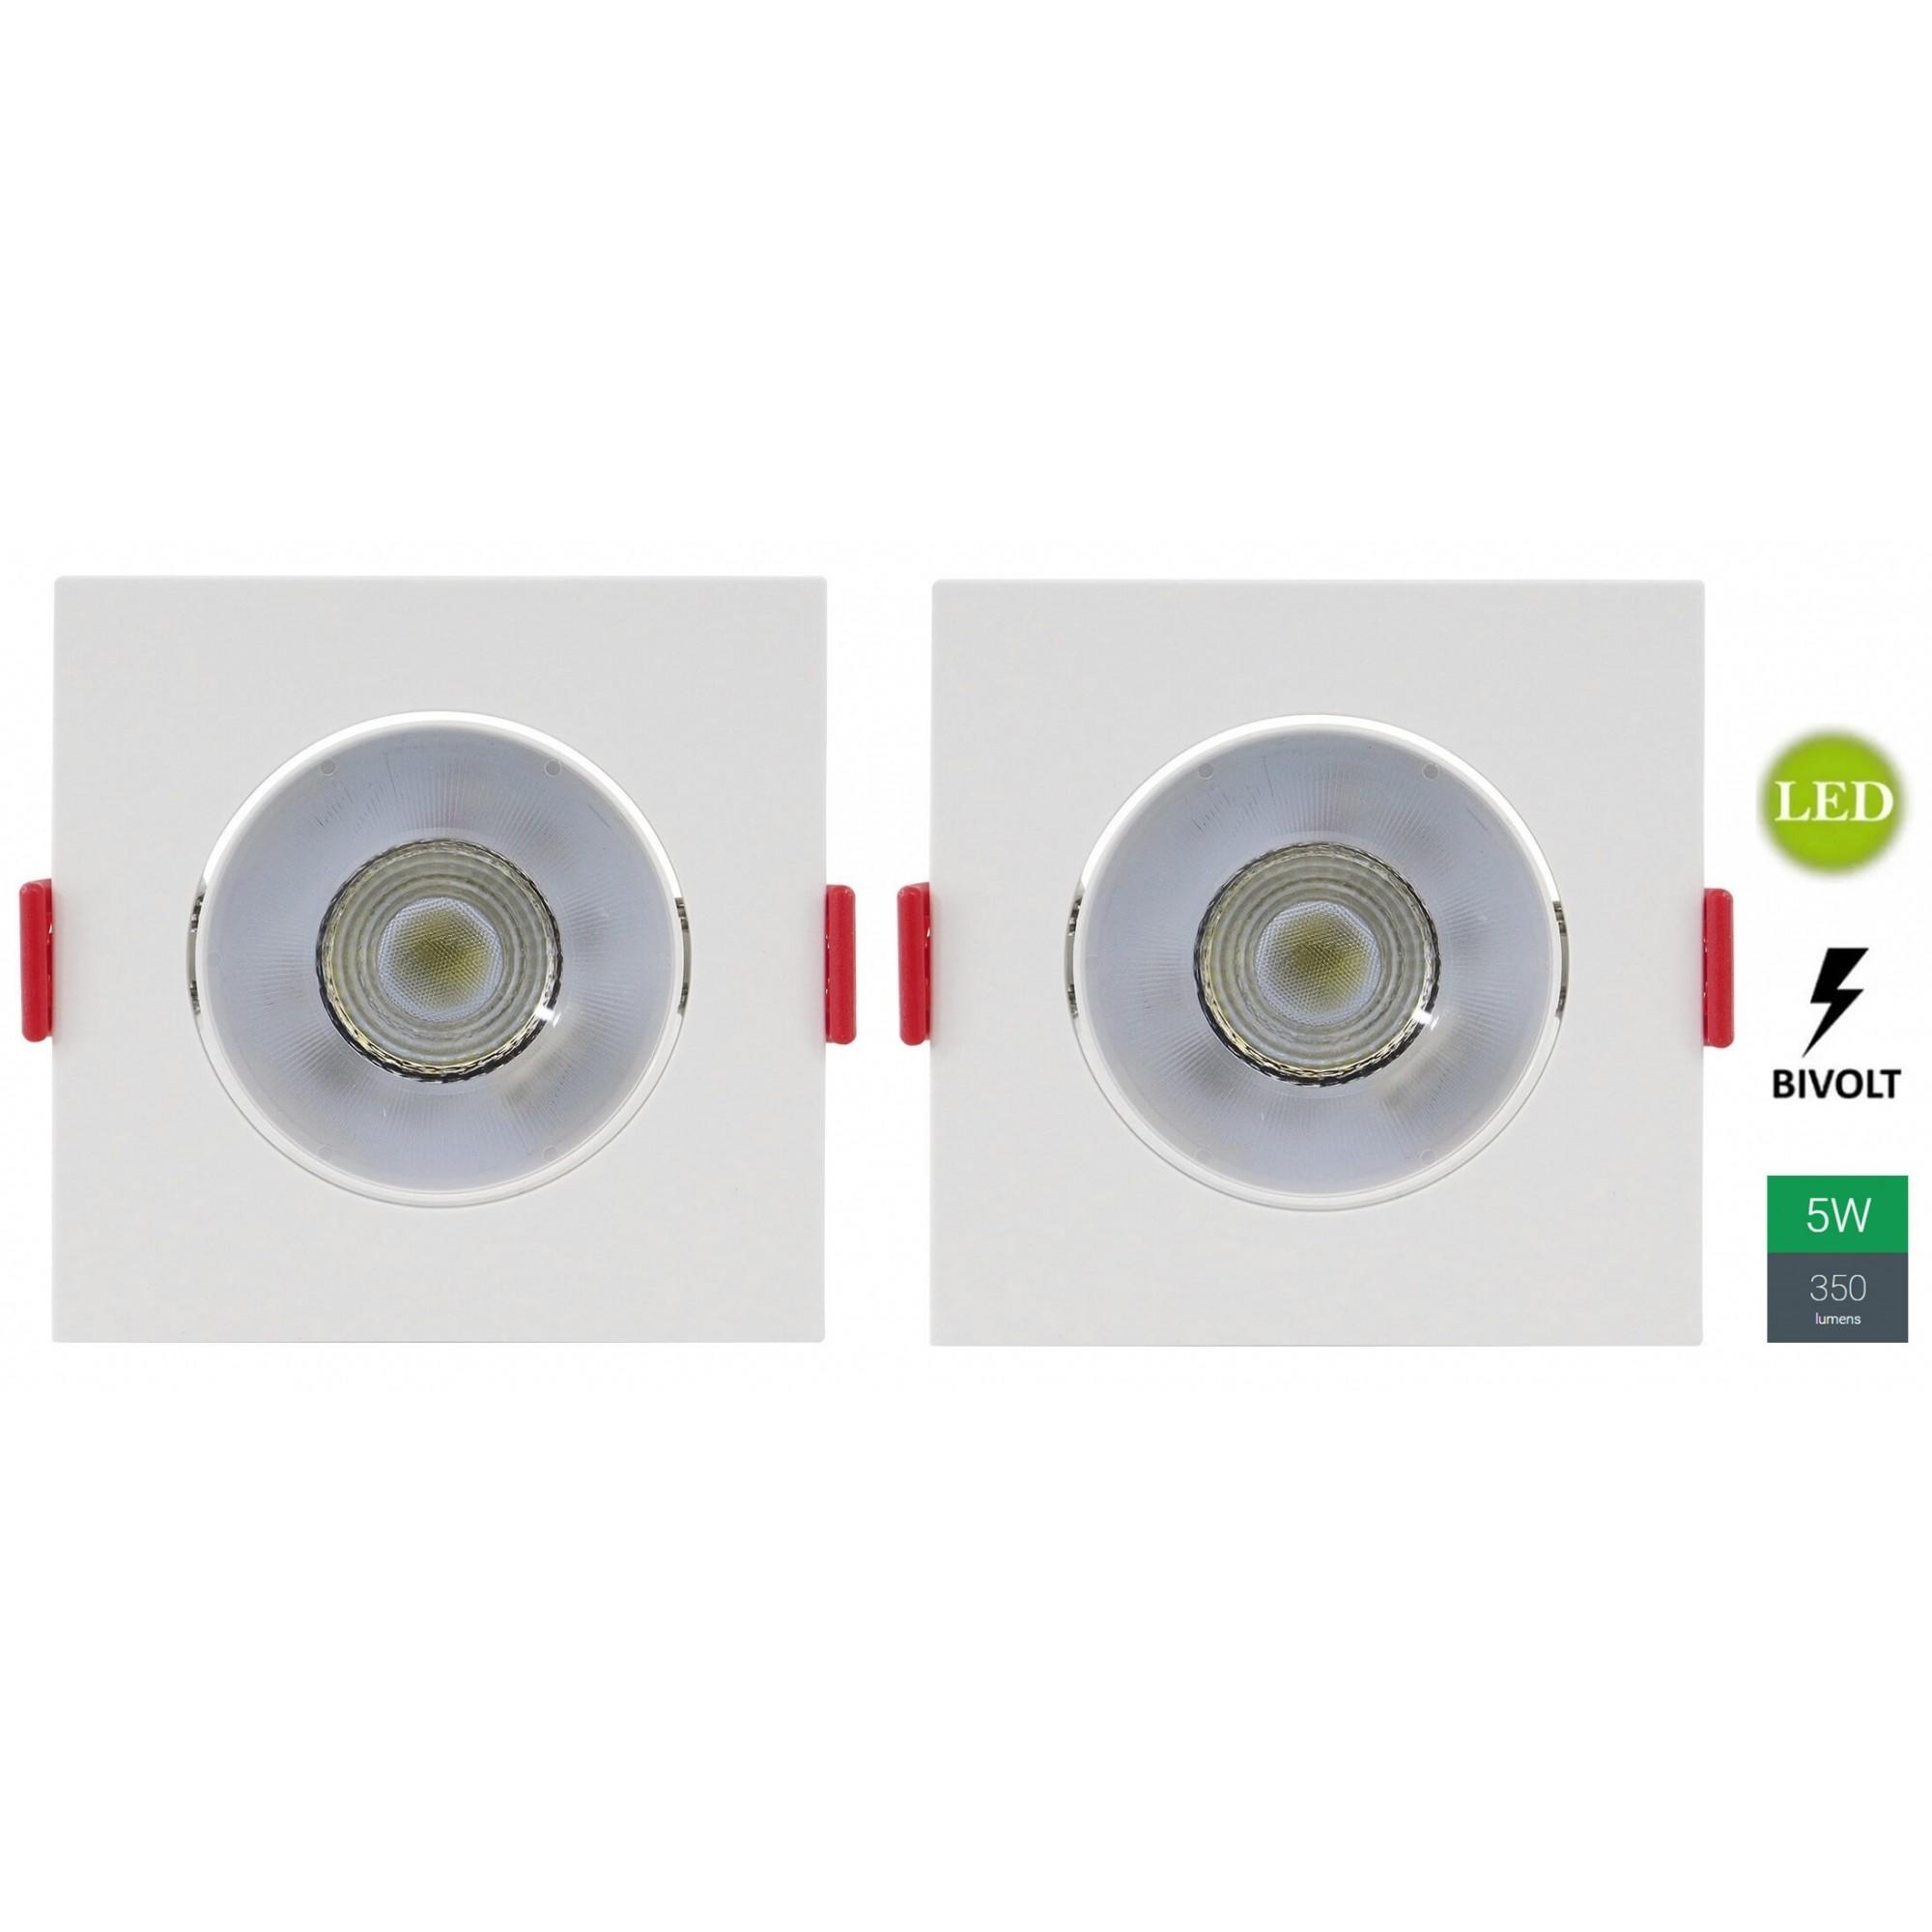 Kit 2 Spots Embutir 5w Quadrado Branco Quente